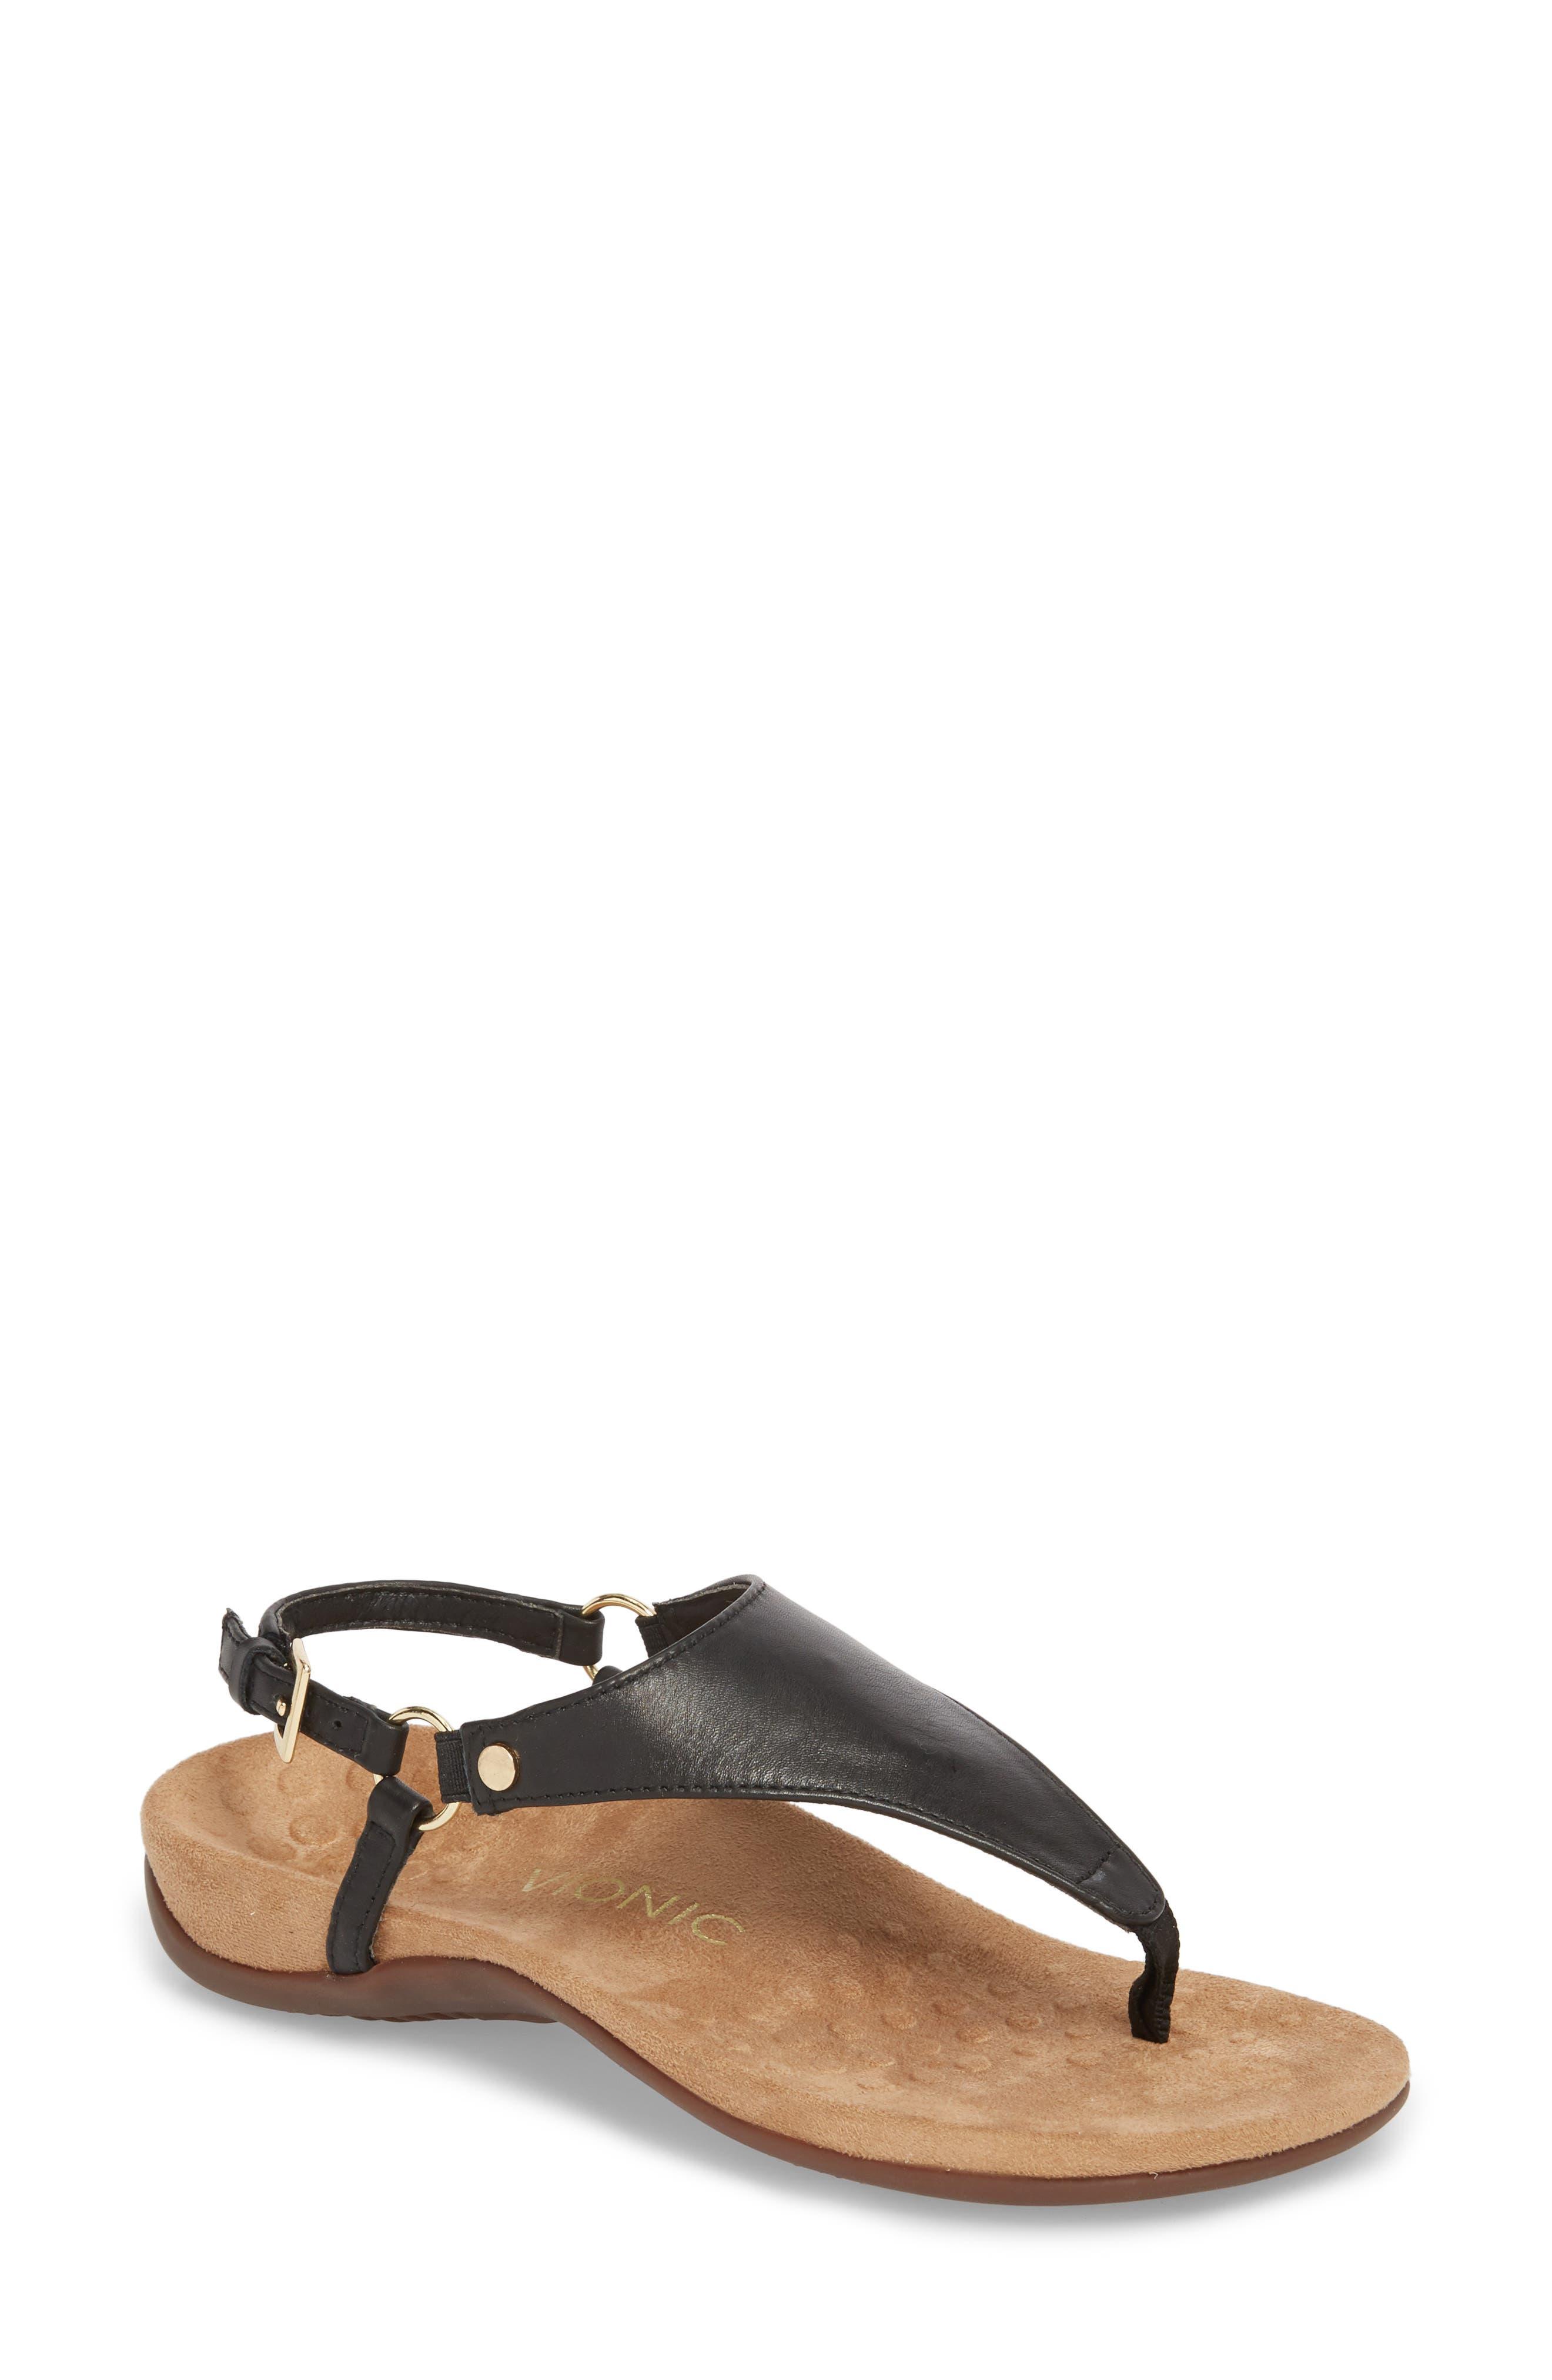 Kirra Orthaheel<sup>®</sup> Sandal,                             Main thumbnail 1, color,                             Black Leather